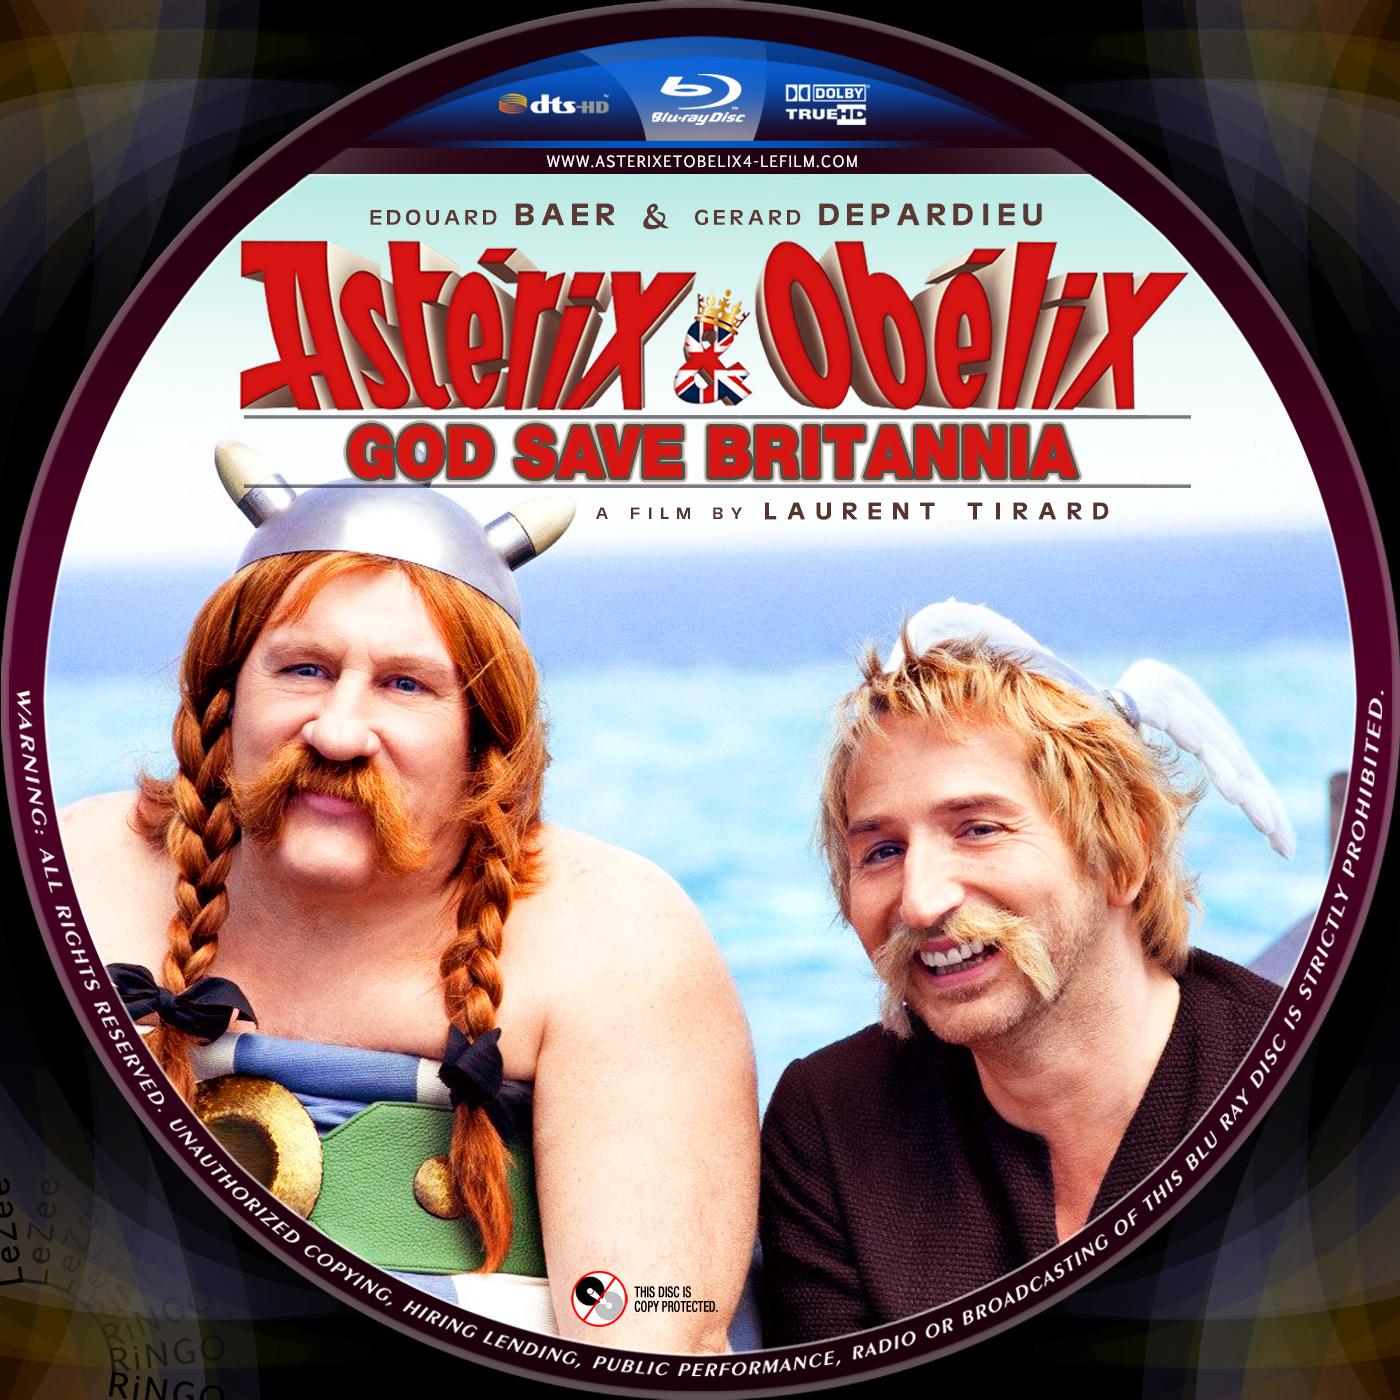 Asterix And Obelix: God Save Britannia Pics, Movie Collection